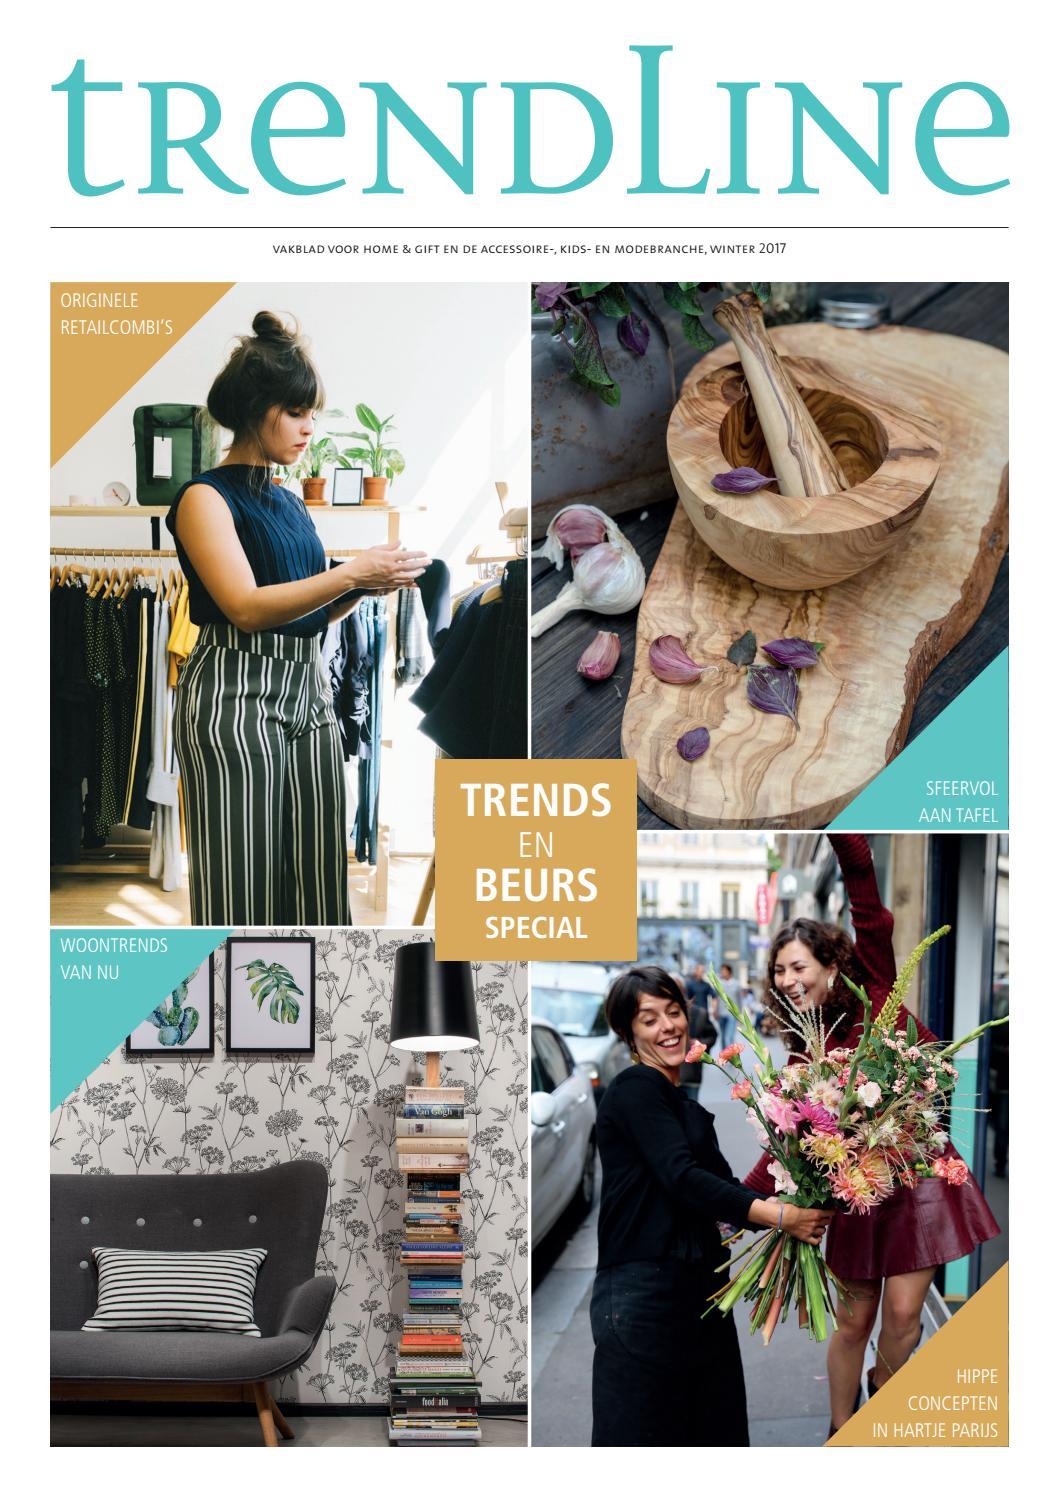 fd3fac3be02915 Trendline Magazine #4 - 2017 by LT Media - issuu